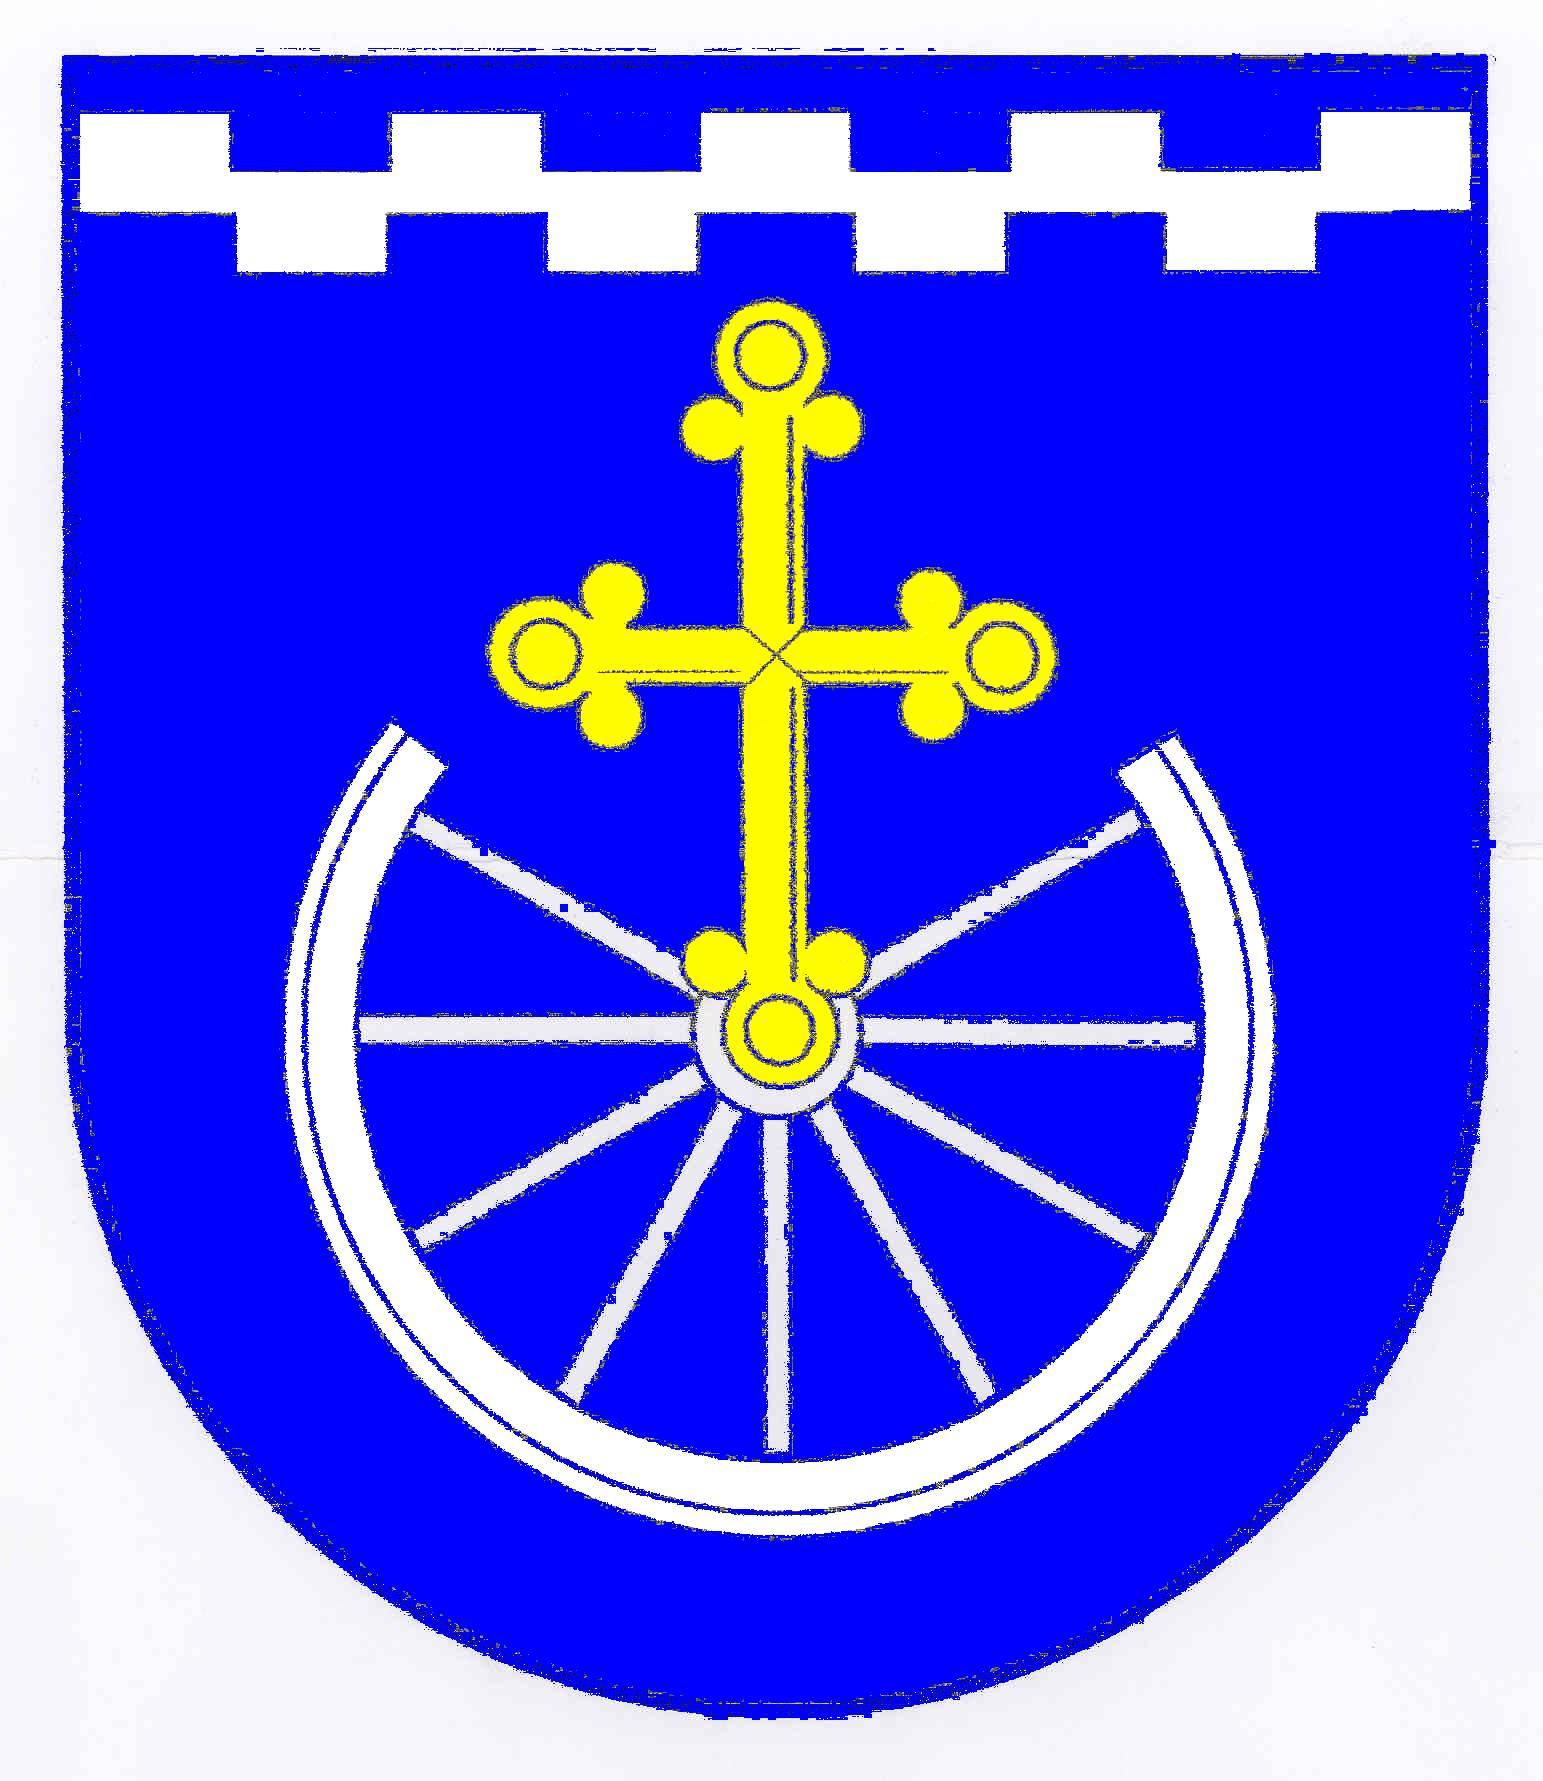 Wappen GemeindeKirchbarkau, Kreis Plön